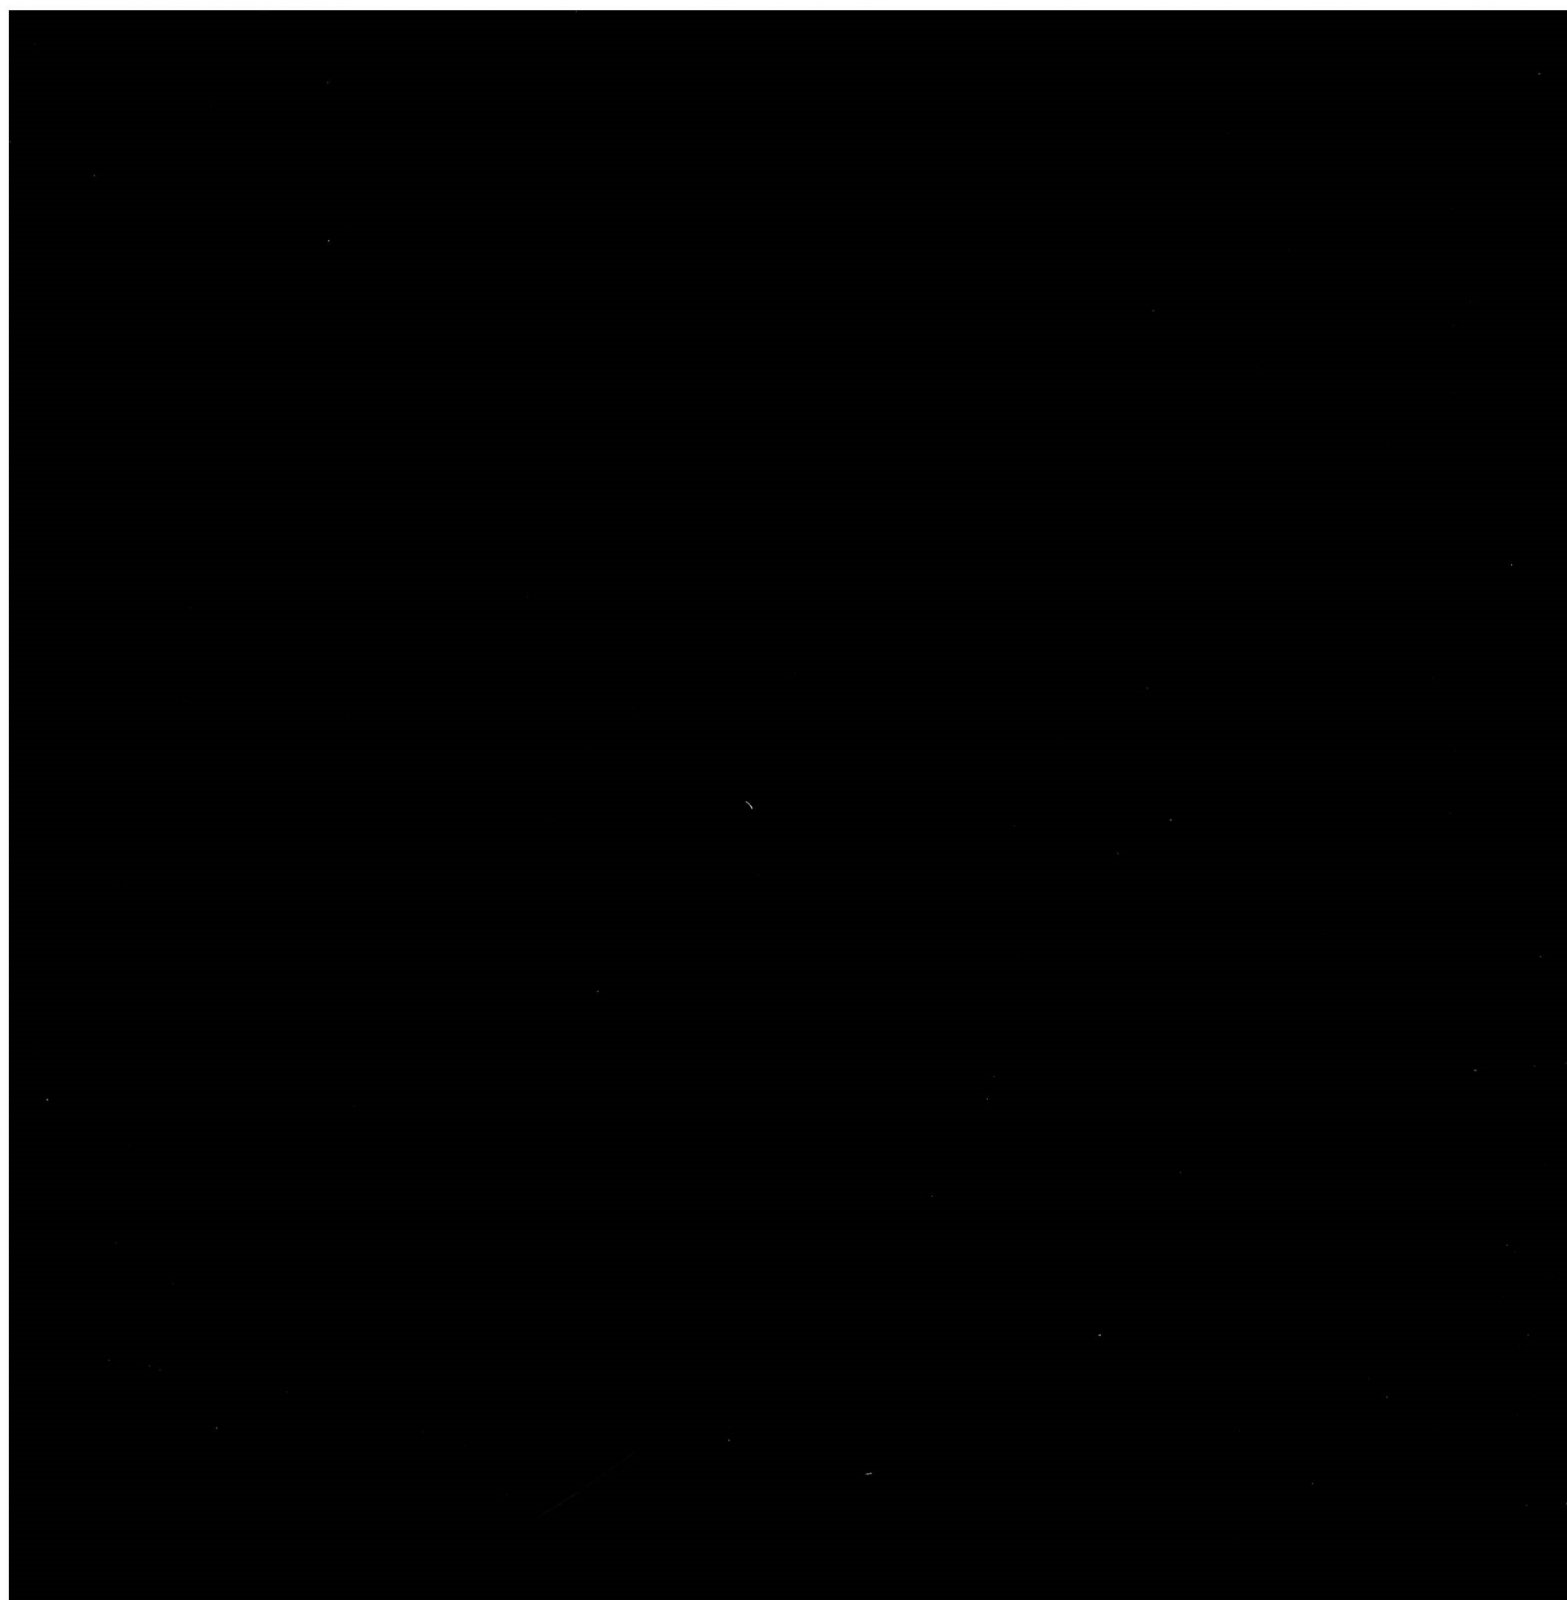 AC Cardstock 12X12 doux/lisse Noir 80lbs - Smooth Cardstock, Black Item # 71766